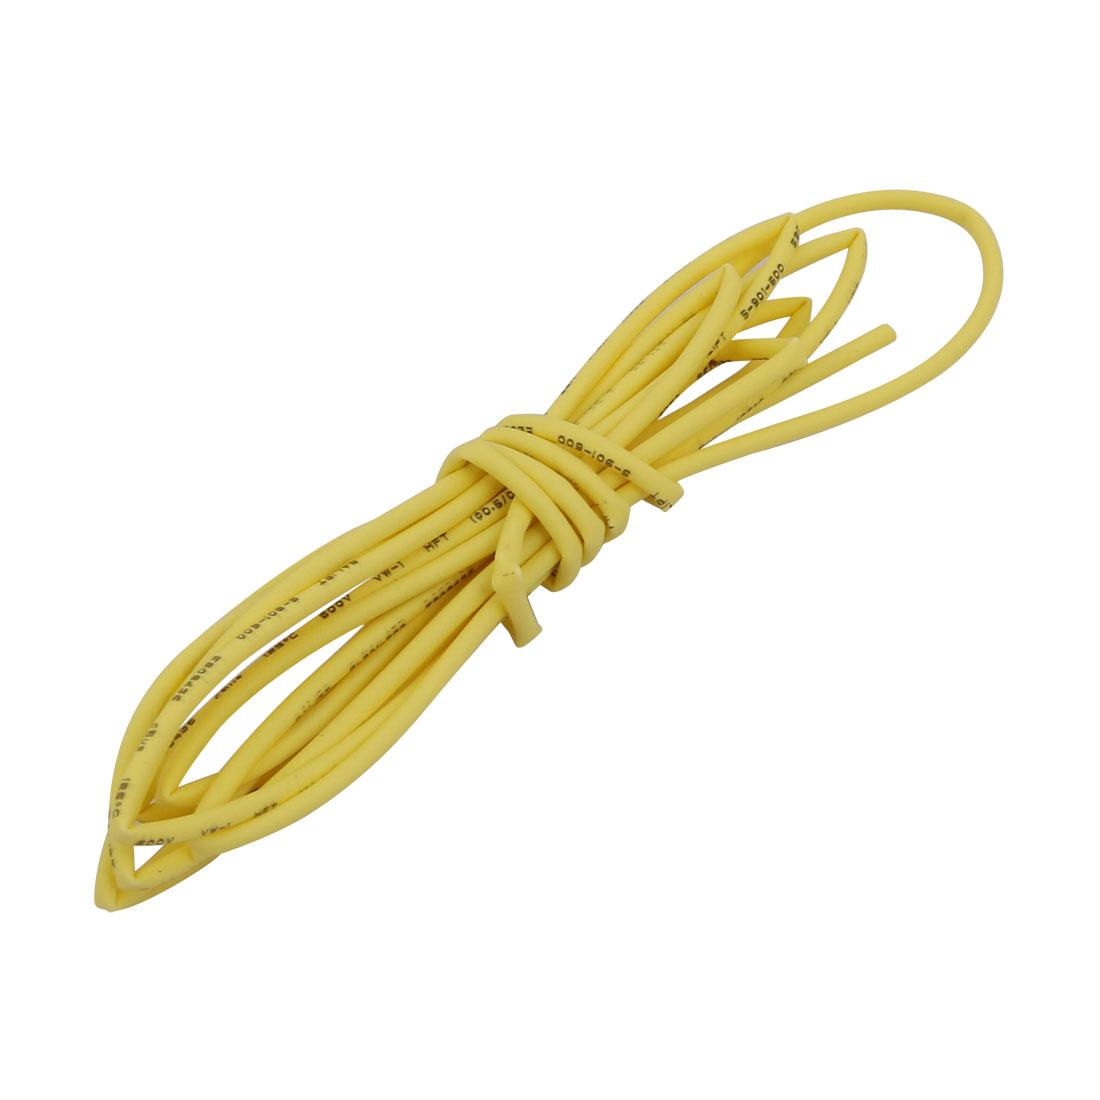 Polyolefin Heat Shrinkable Flame Retardant Tube 1M Long 0.6mm Inner Dia Yellow